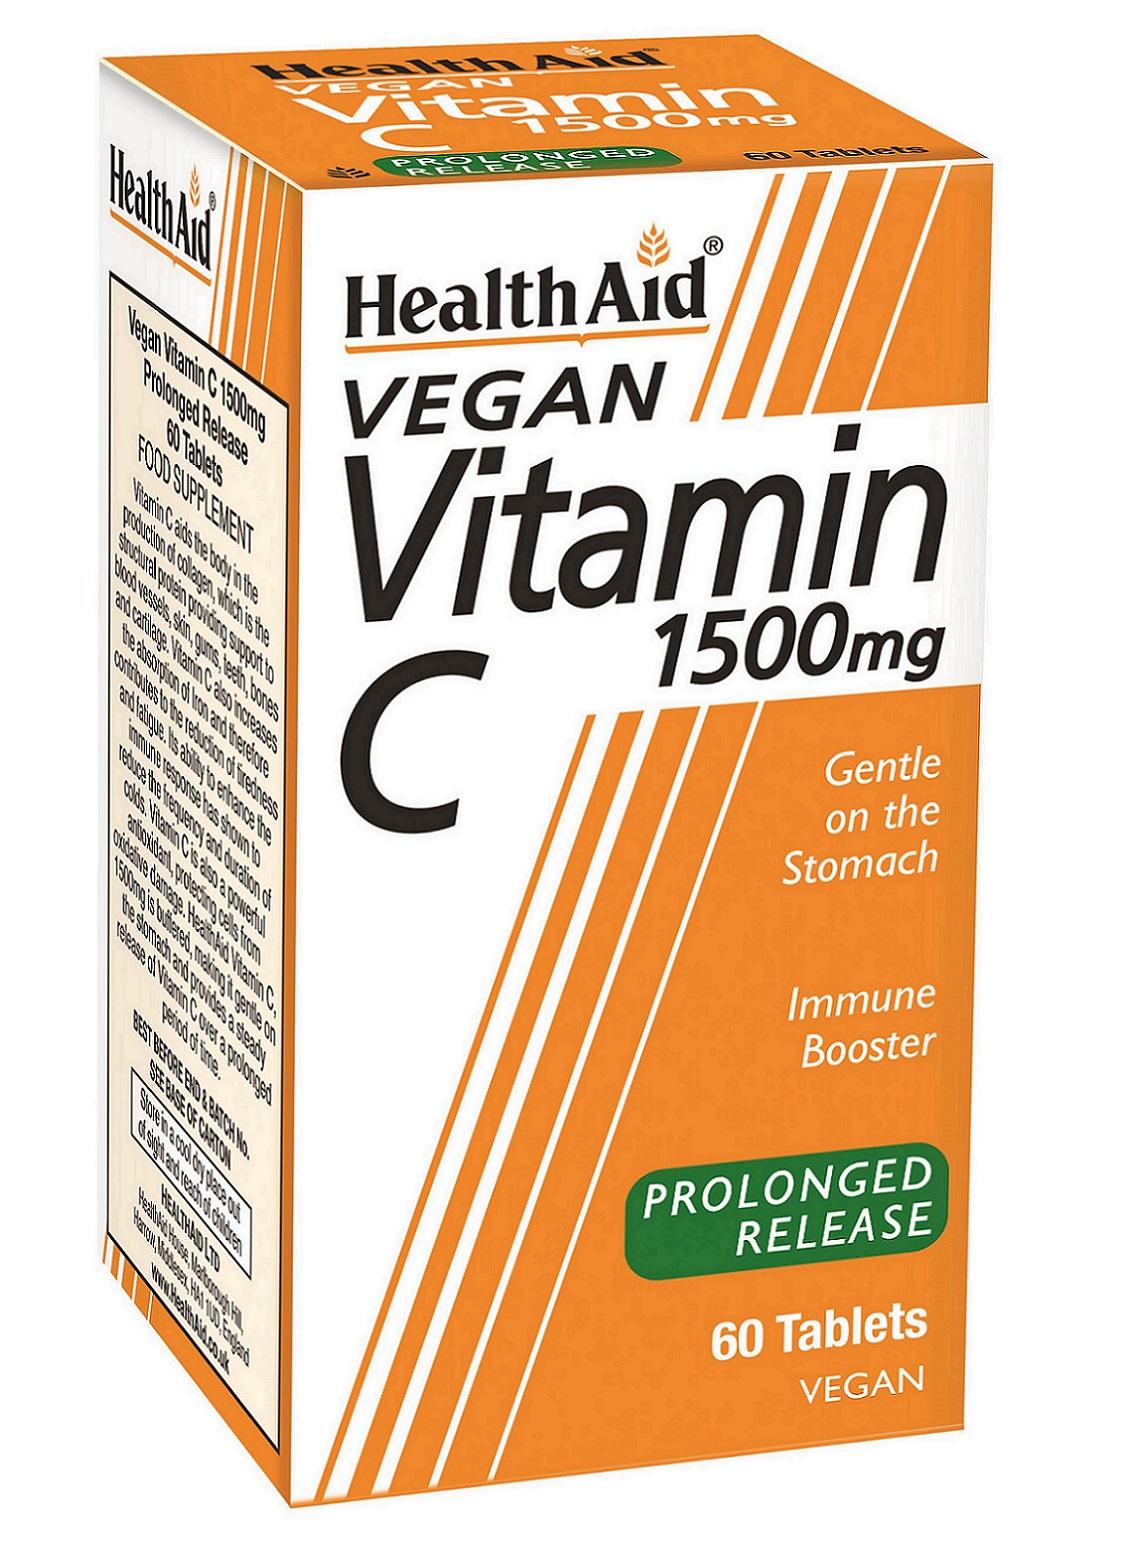 Vegan Vitamin C 1500mg Prolonged Release 60's